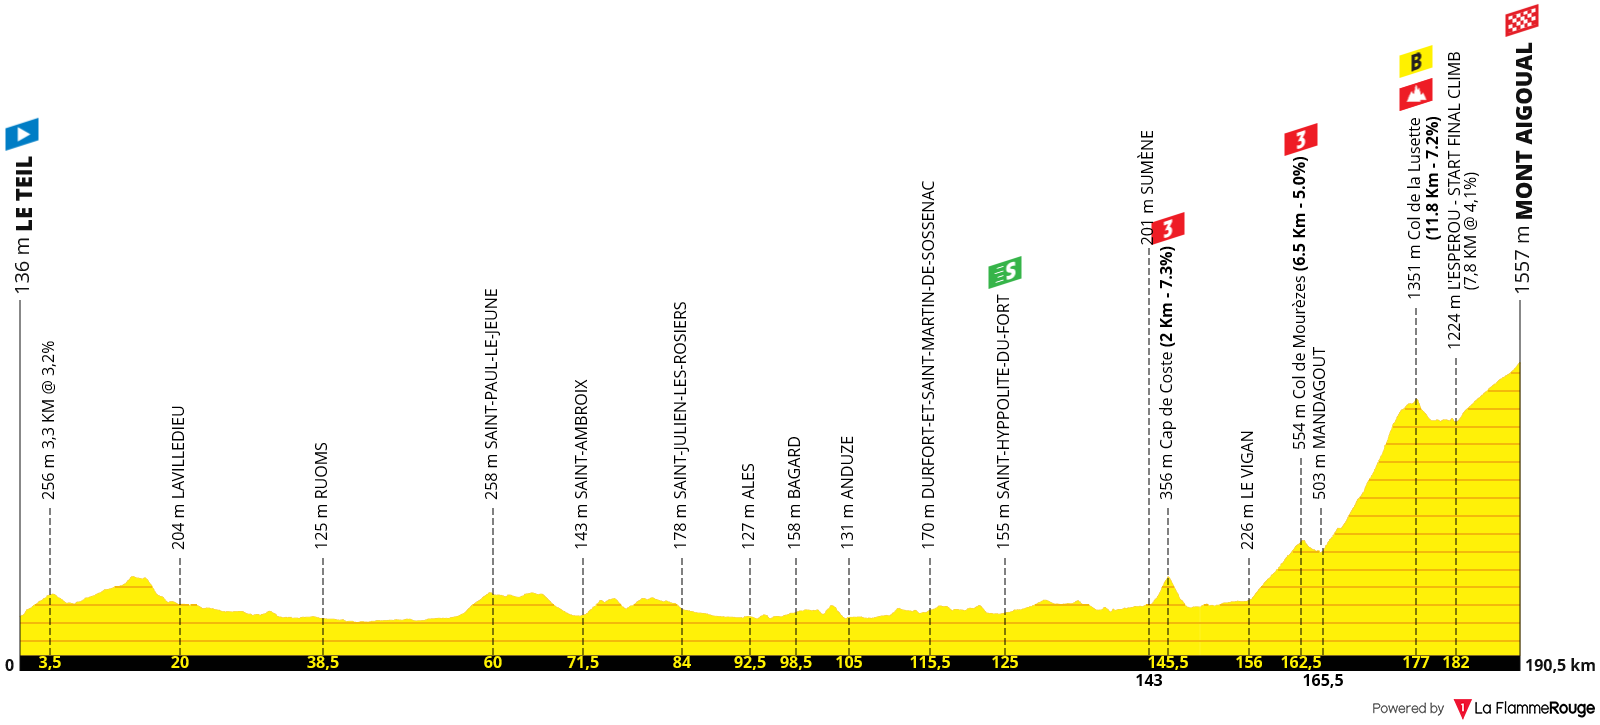 Perfil Etapa 06 - Tour de Francia 2020 - Le Teil > Mont Aigoual - 191km